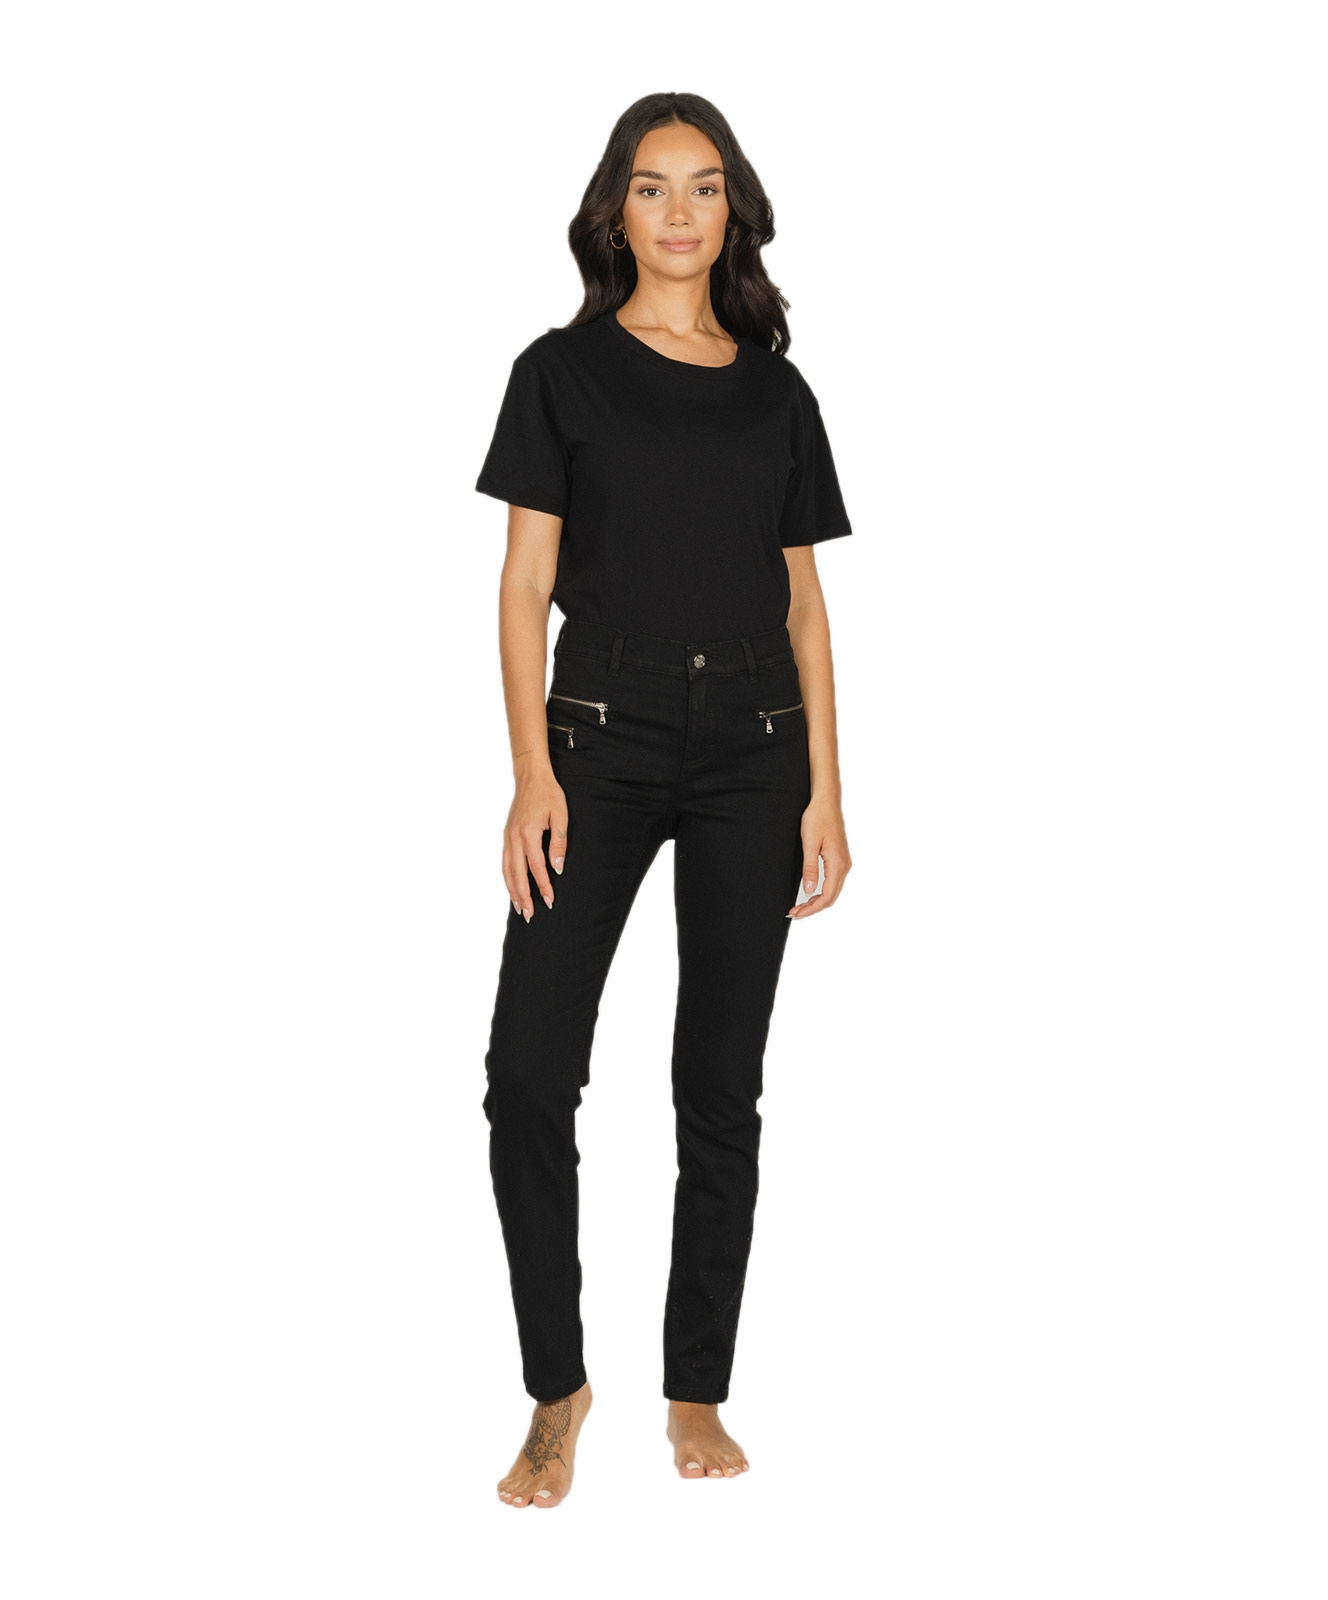 Hosen - Angels Slim Fit Jeans Malu Zip in Black  - Onlineshop Jeans Meile